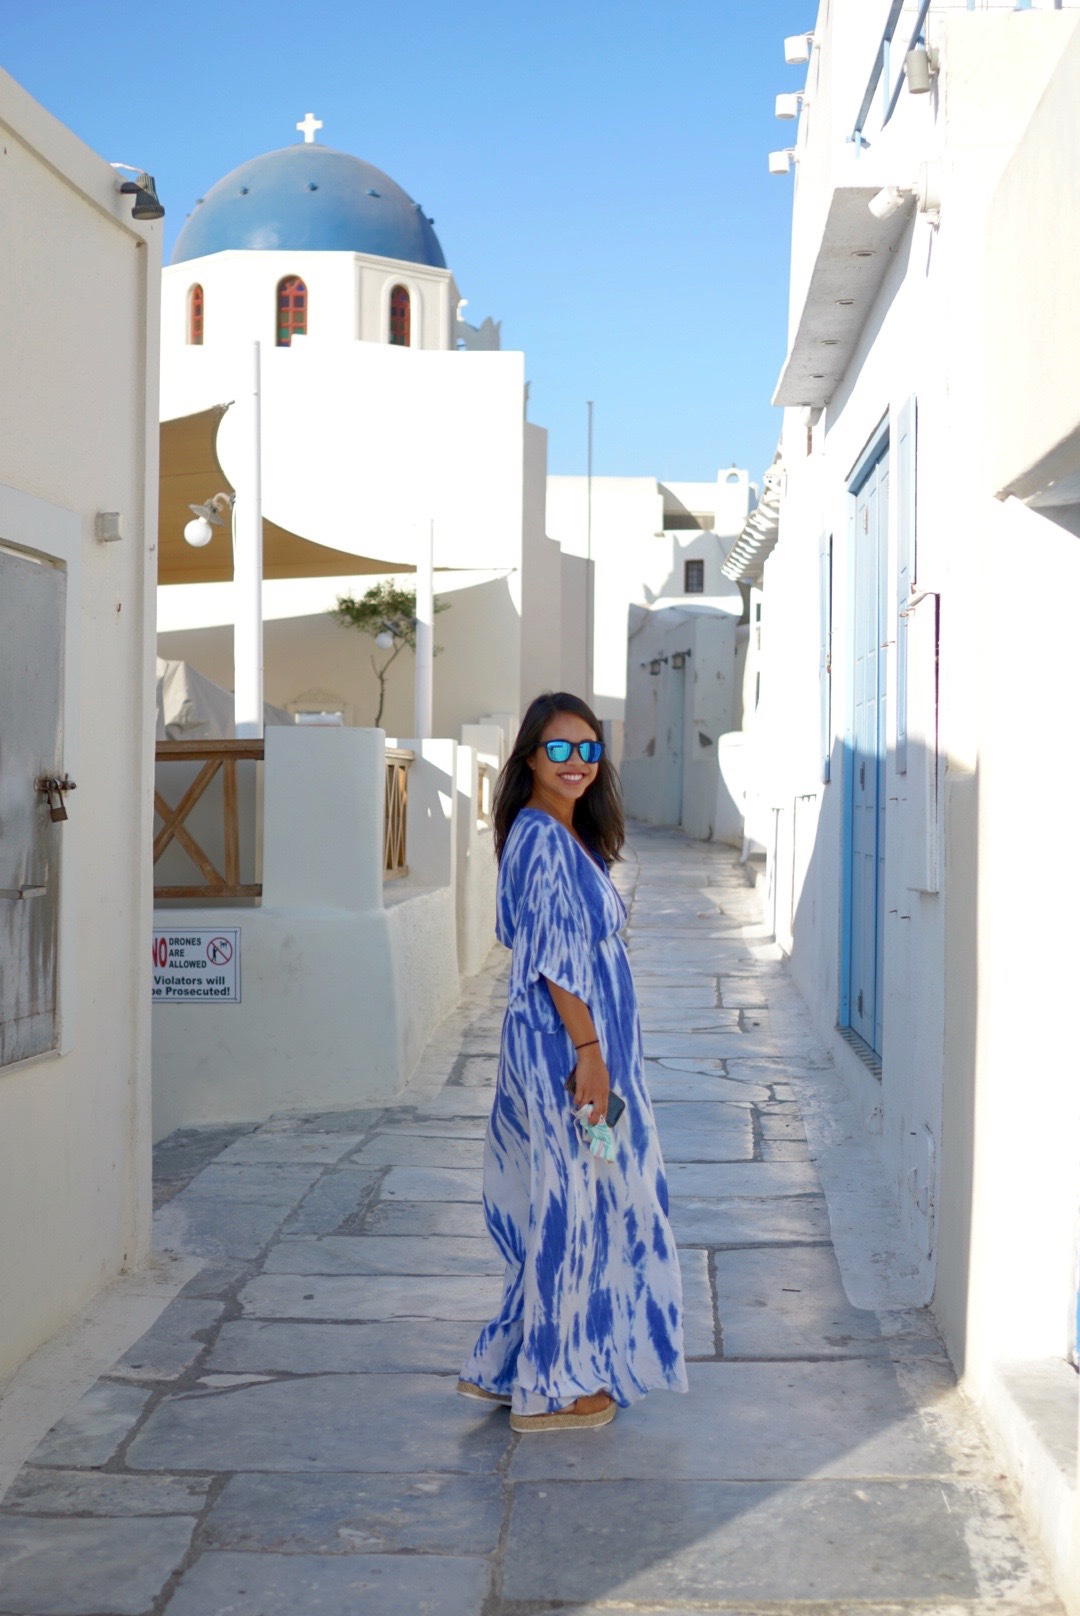 acs 0219 - A Few Days in Santorini